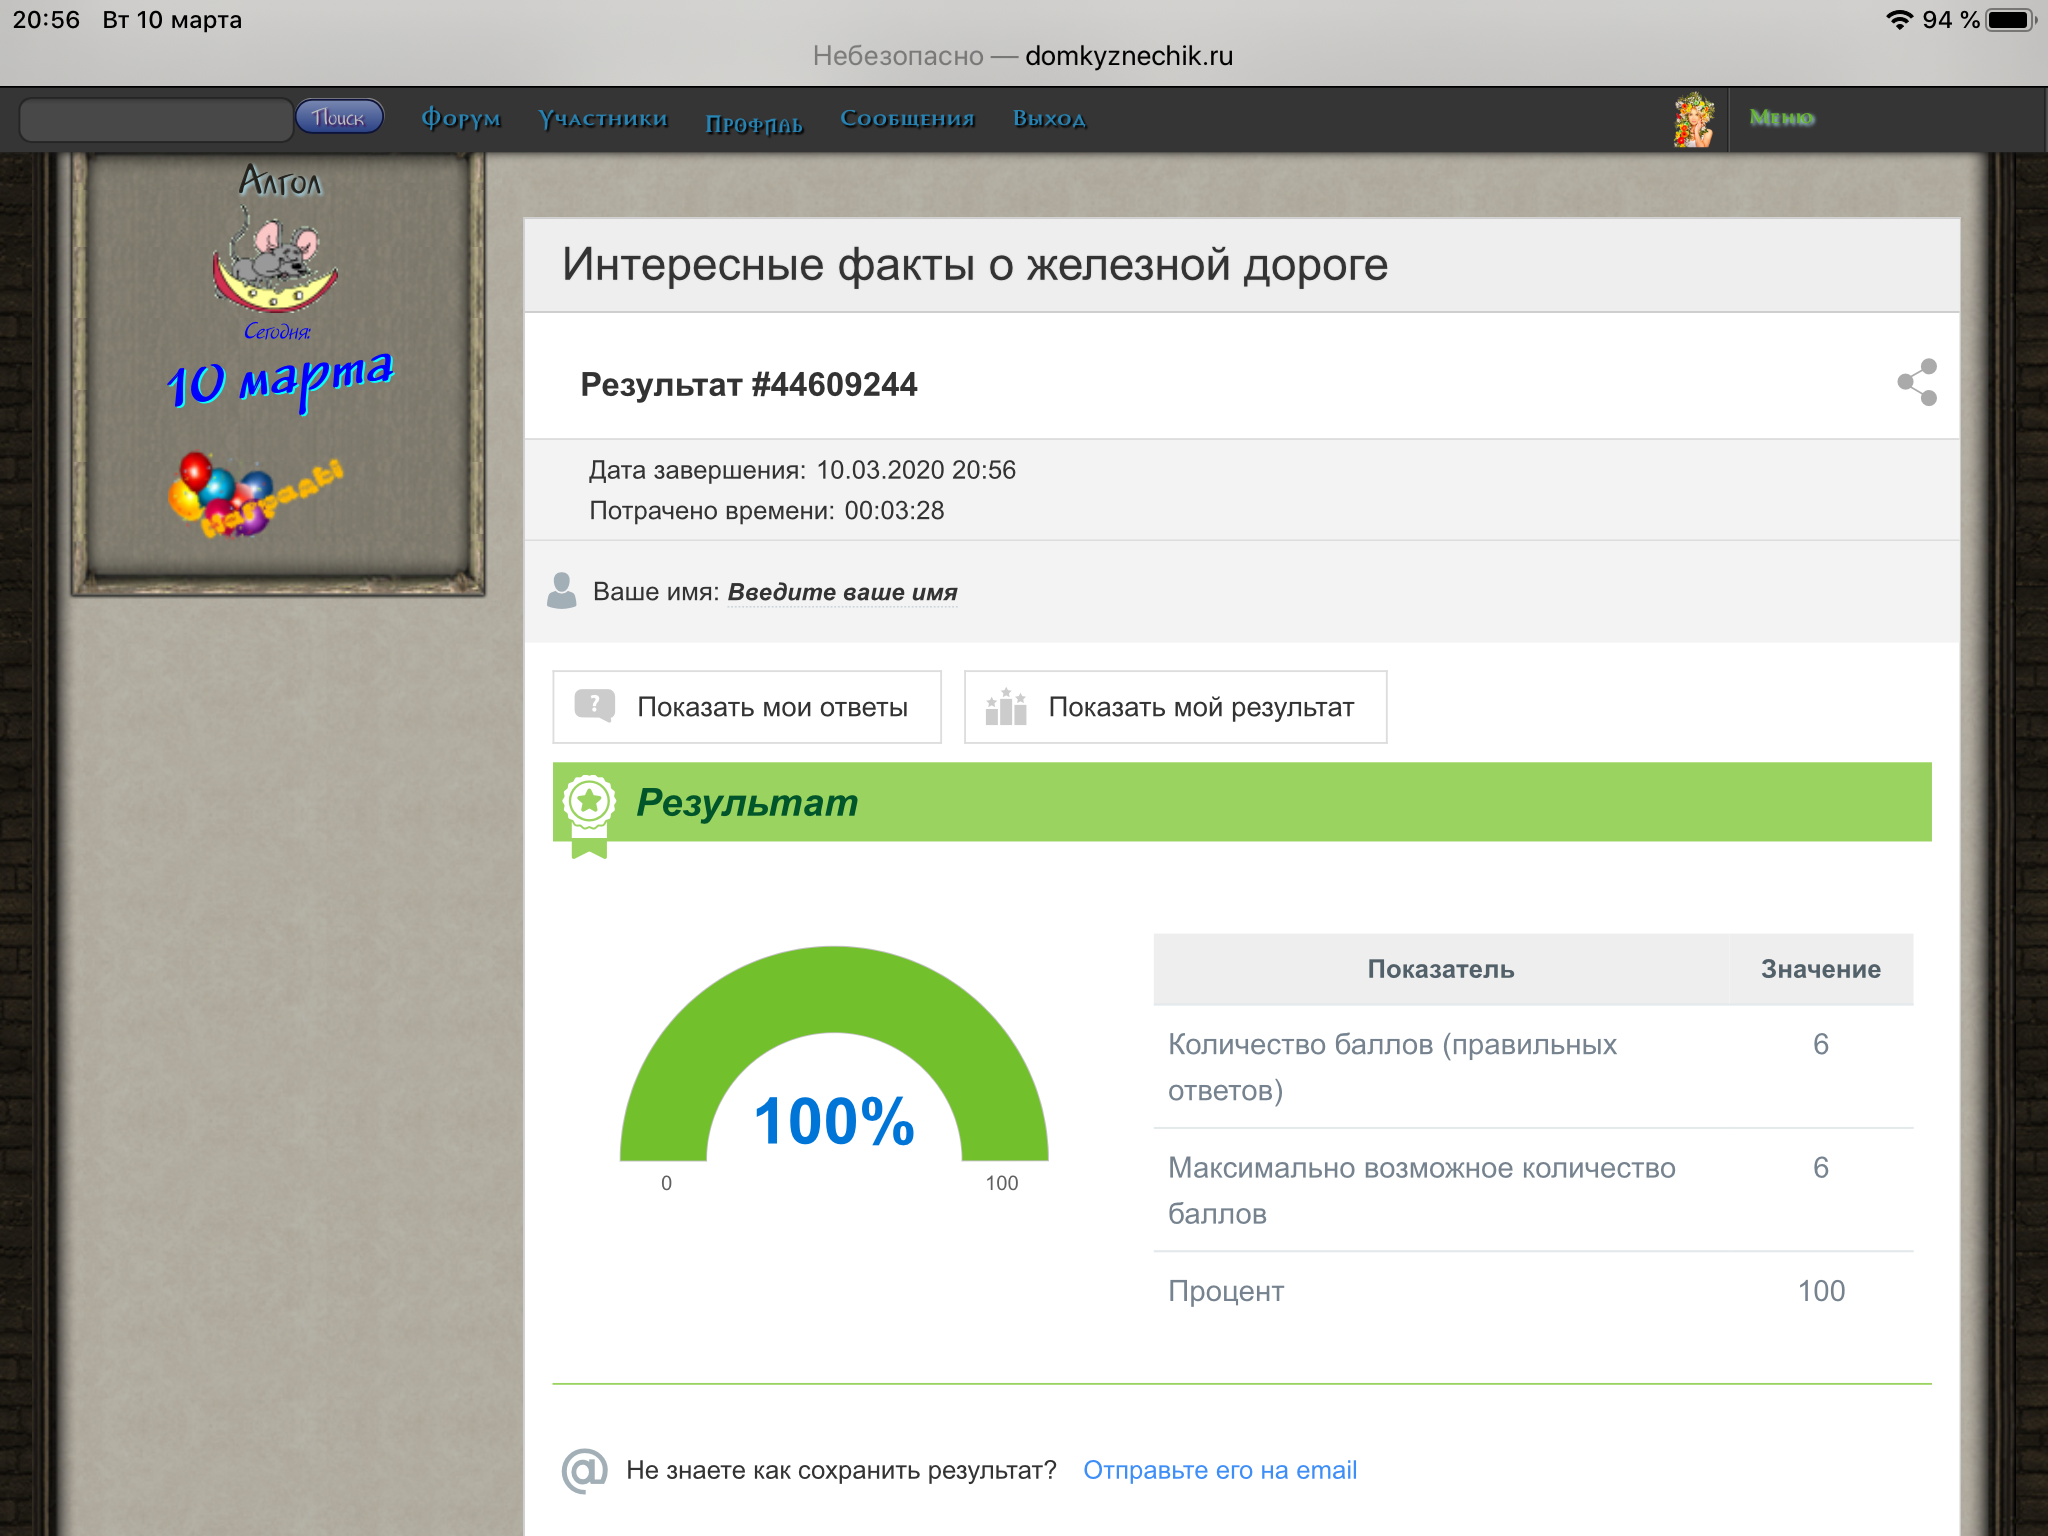 https://i4.imageban.ru/out/2020/03/10/827de4d91b9b5b90e117ed9a643cf6f4.png